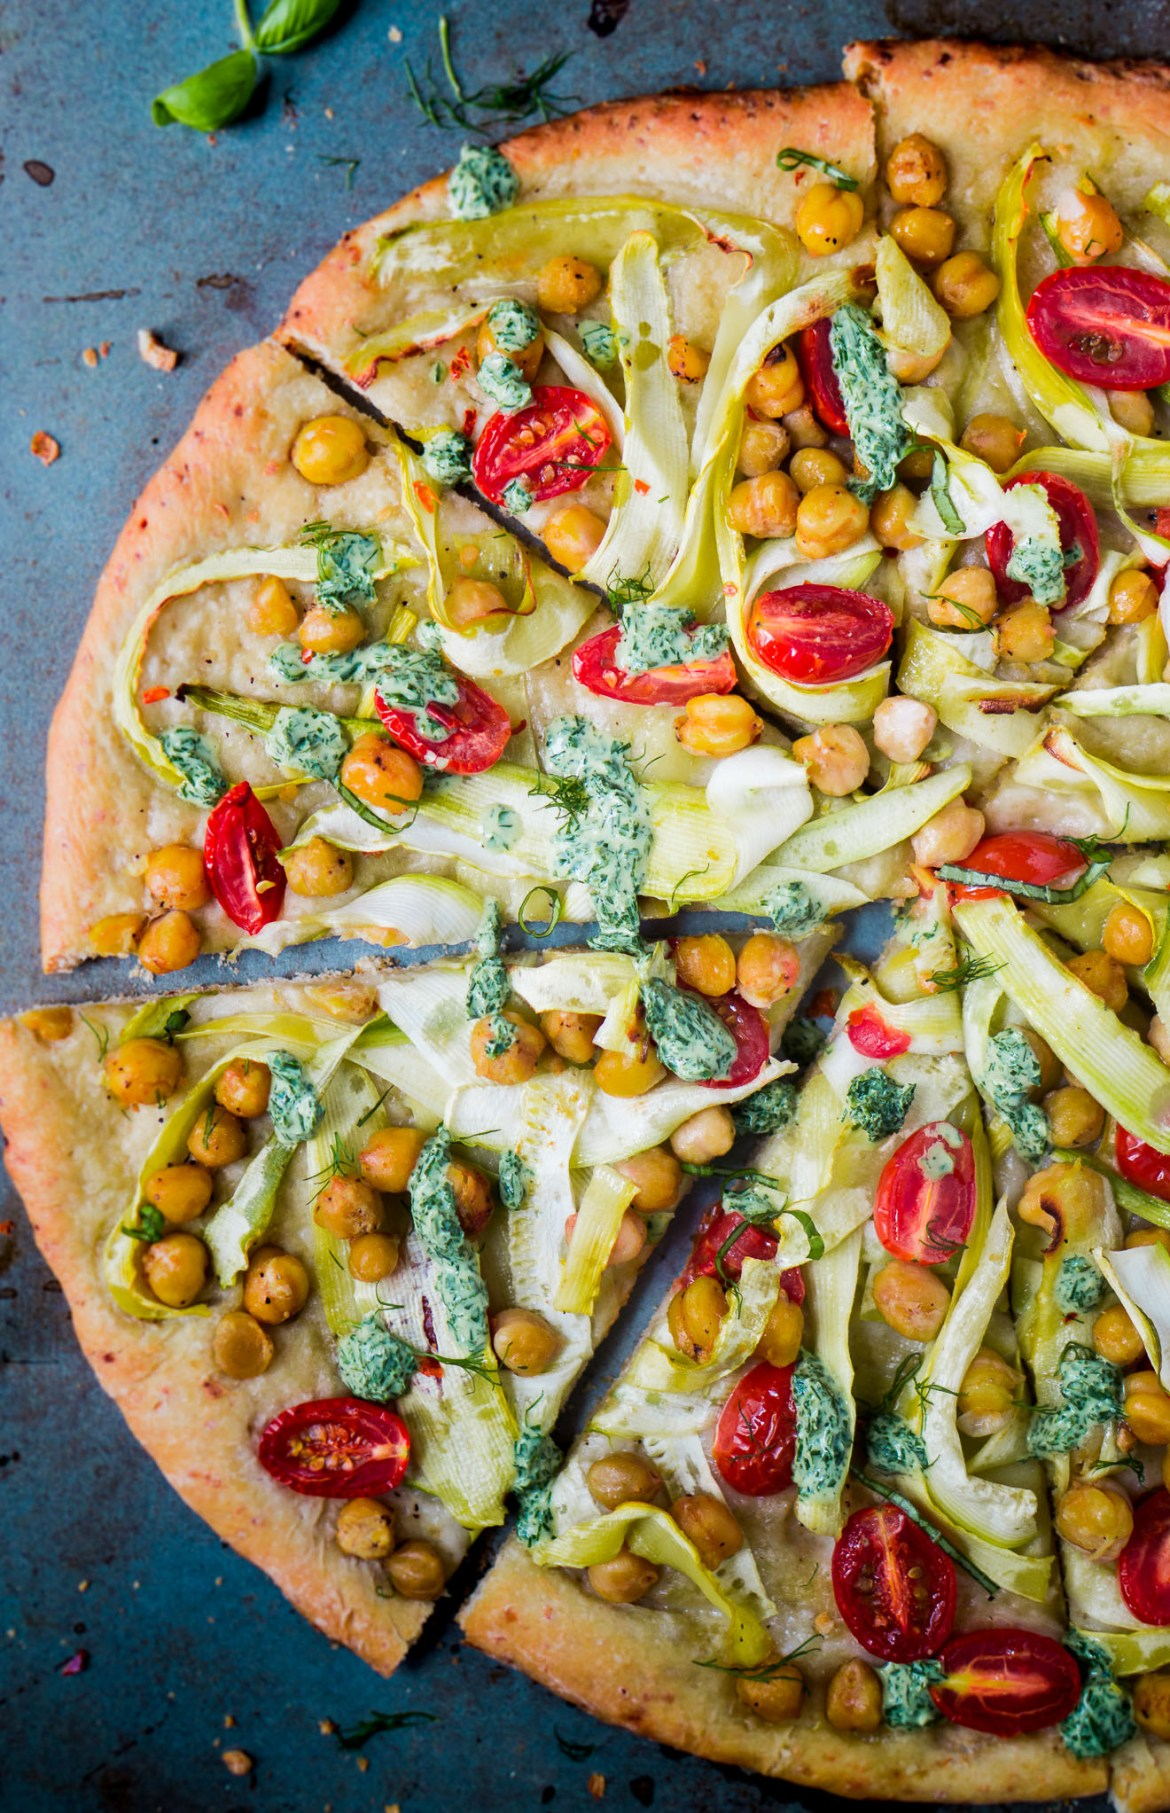 Summer-Squash-Veggie-Pizza-Simple-Ingredients-Flavorful-Plant-Based